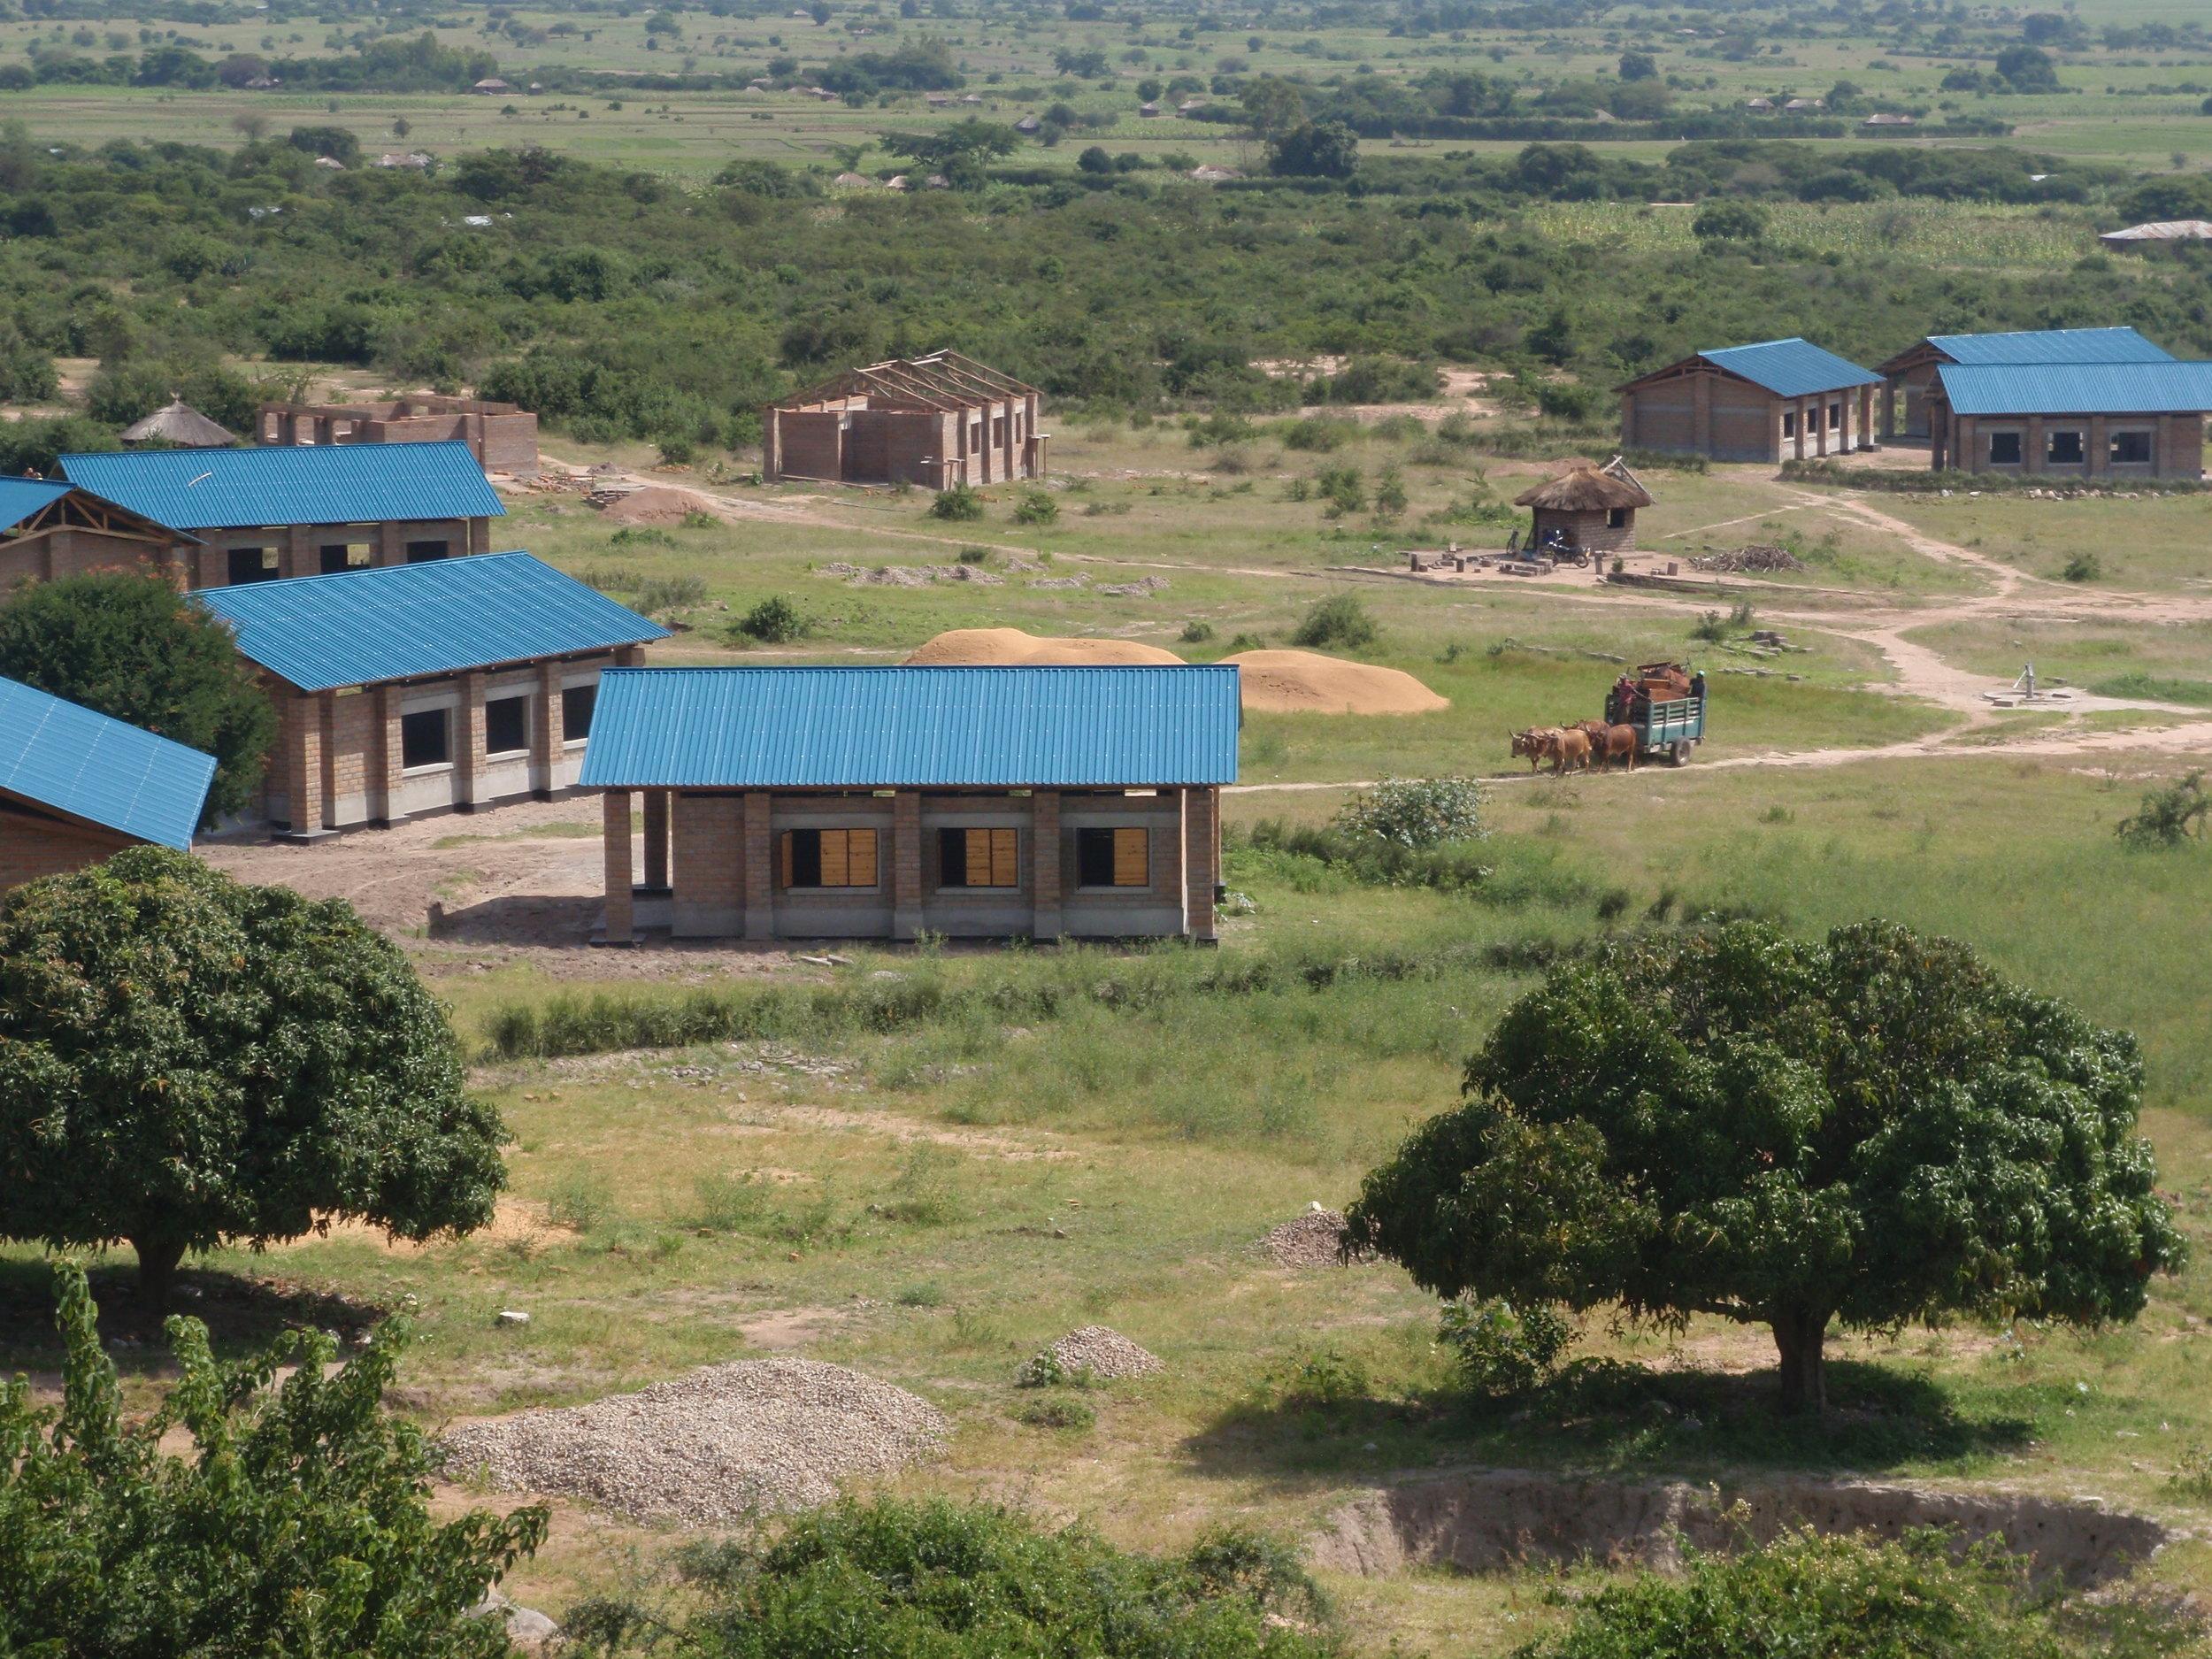 Ntulya Primary School under construction in 2008.